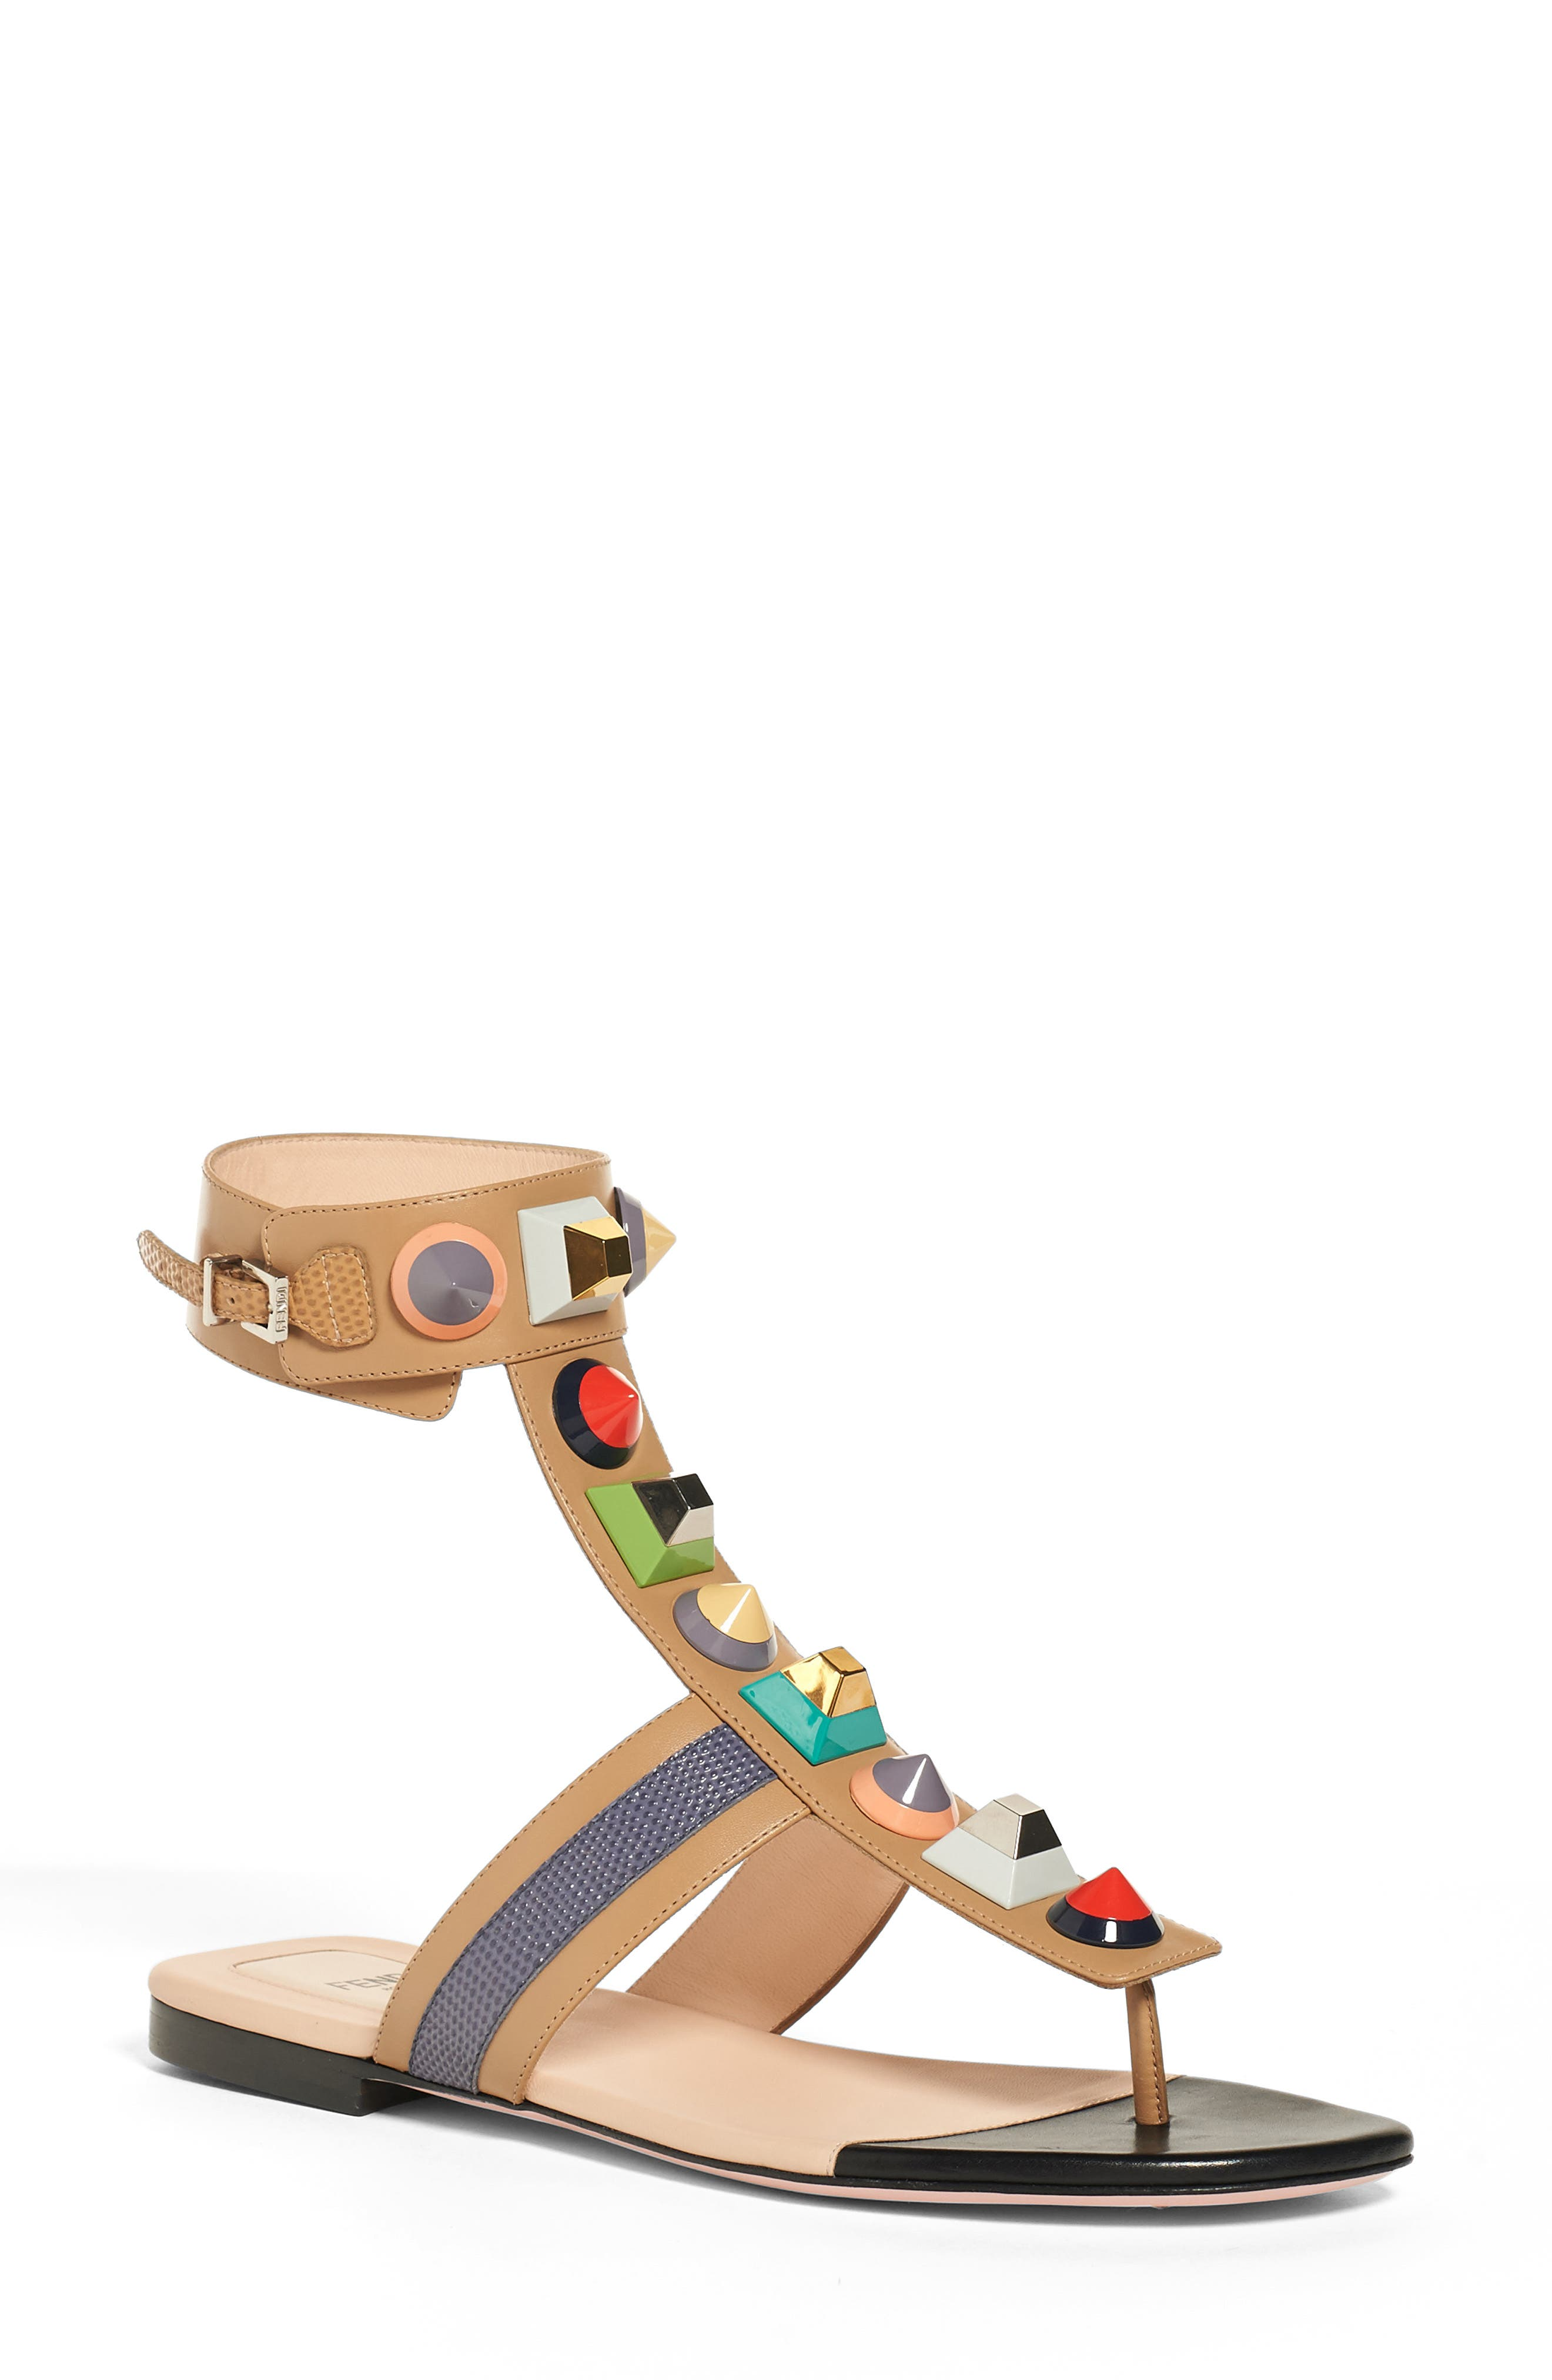 Main Image - Fendi 'Rainbow' Studded Colorblock Gladiator Sandal (Women)